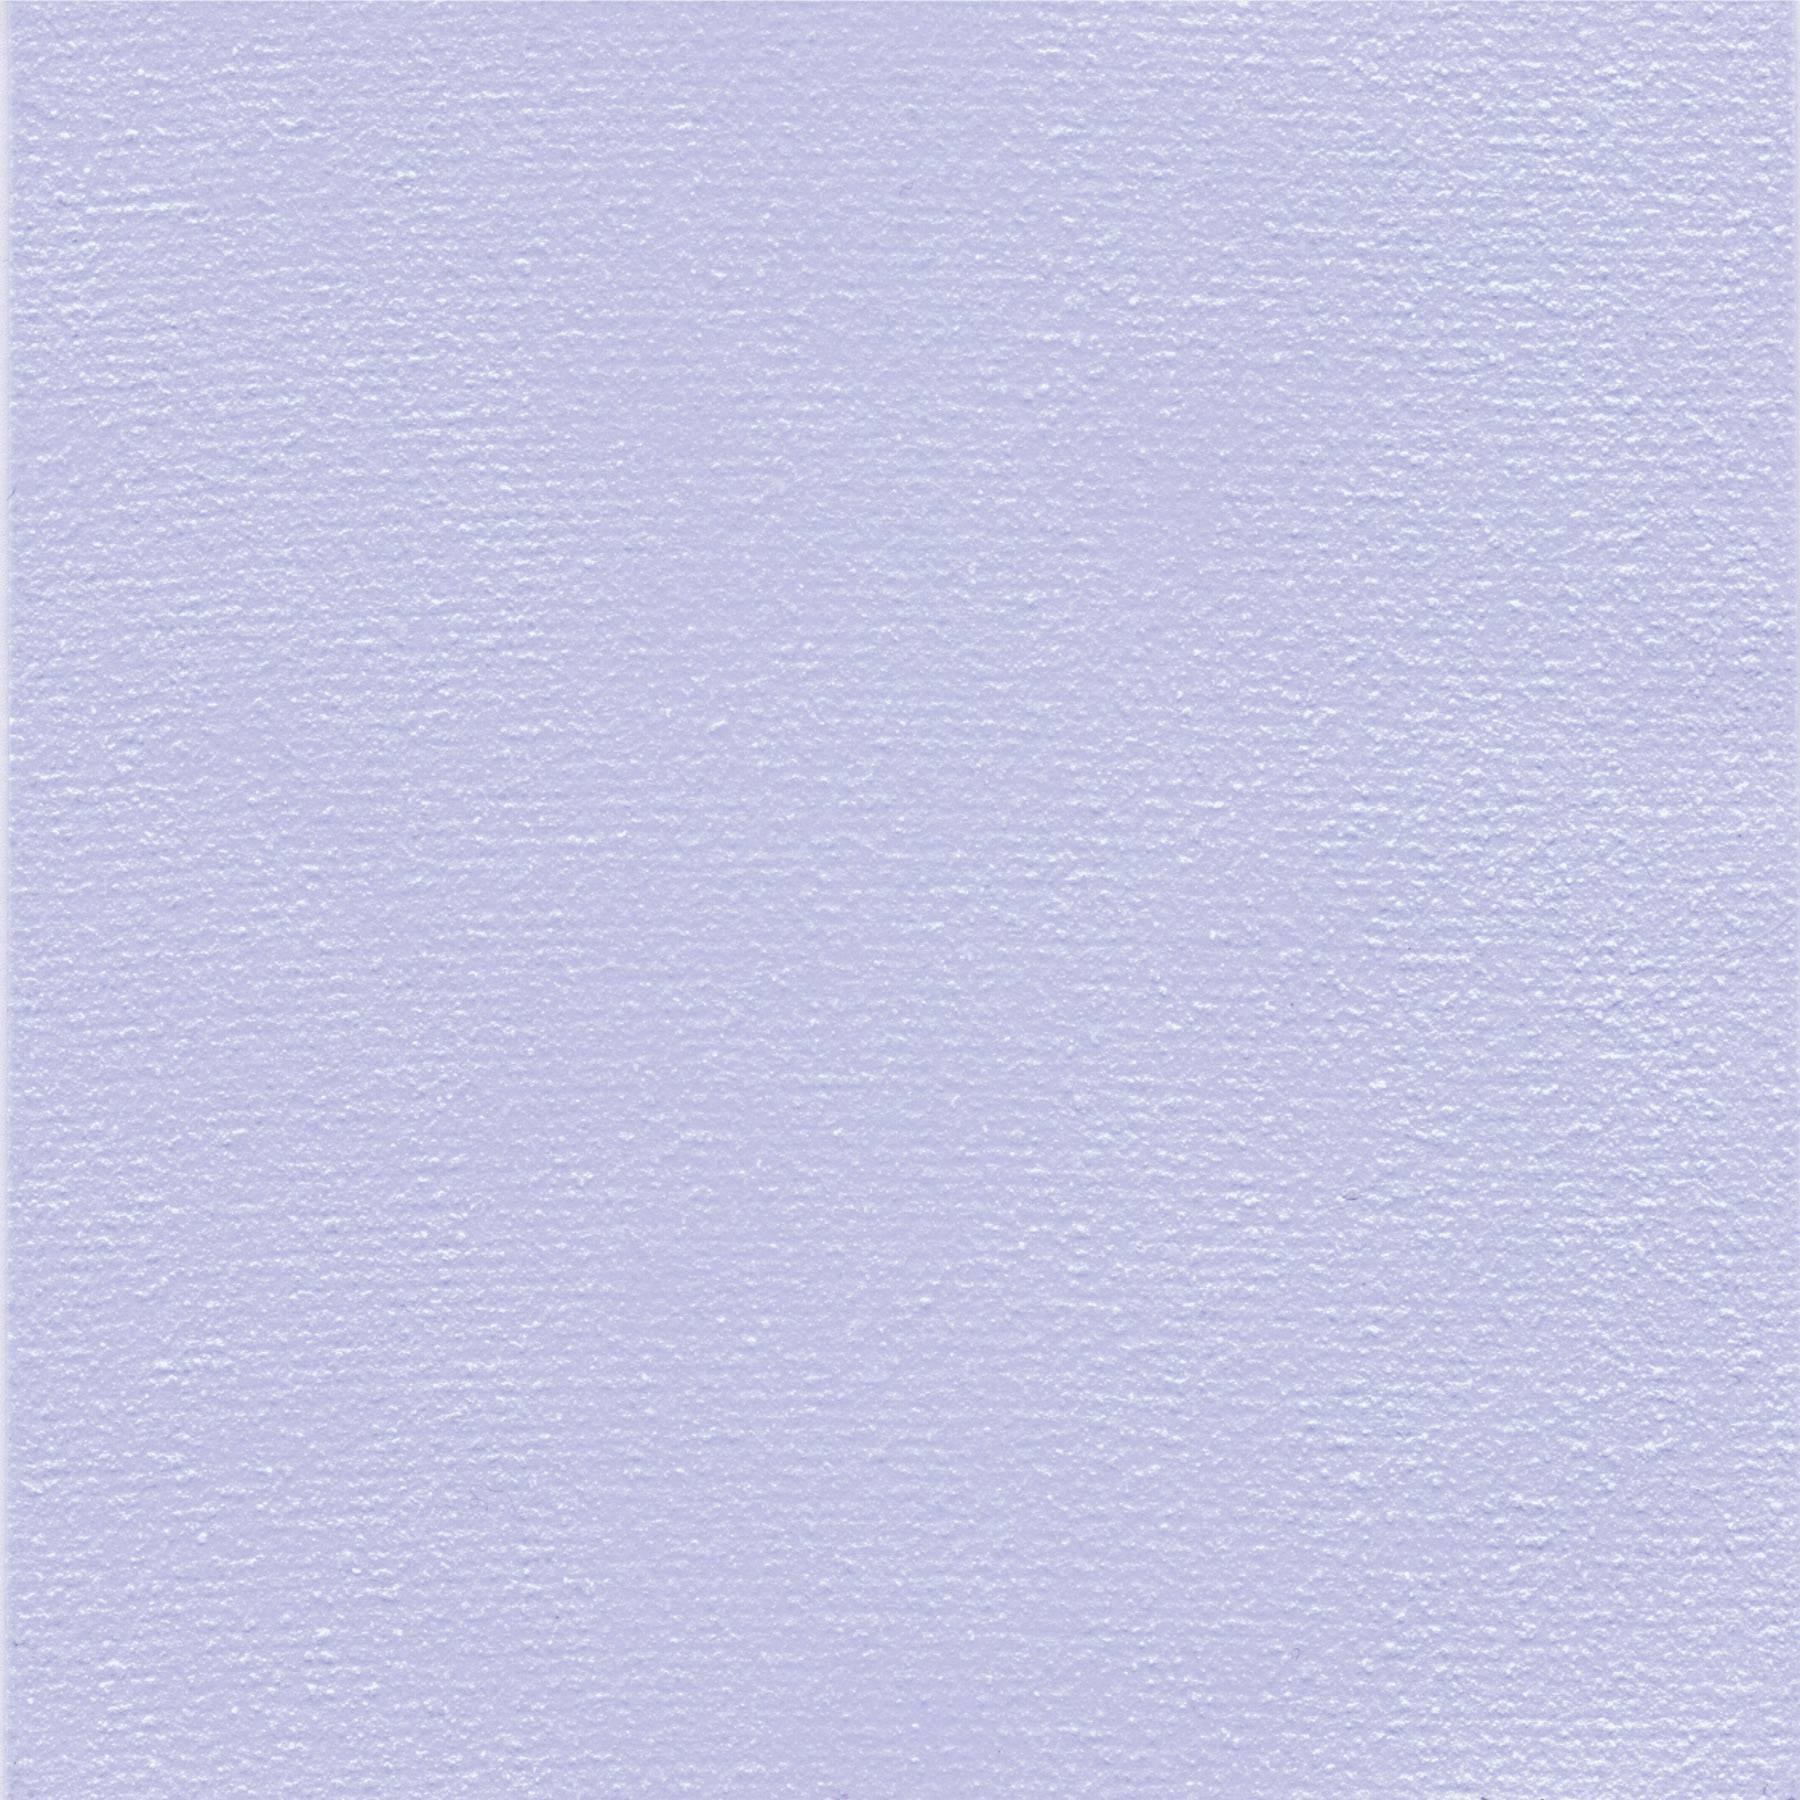 Teplovodivá fólia Kerafol SOFTTHERM 86/300, 0.5 mm, 3 W/mK, (d x š) 200 mm x 120 mm